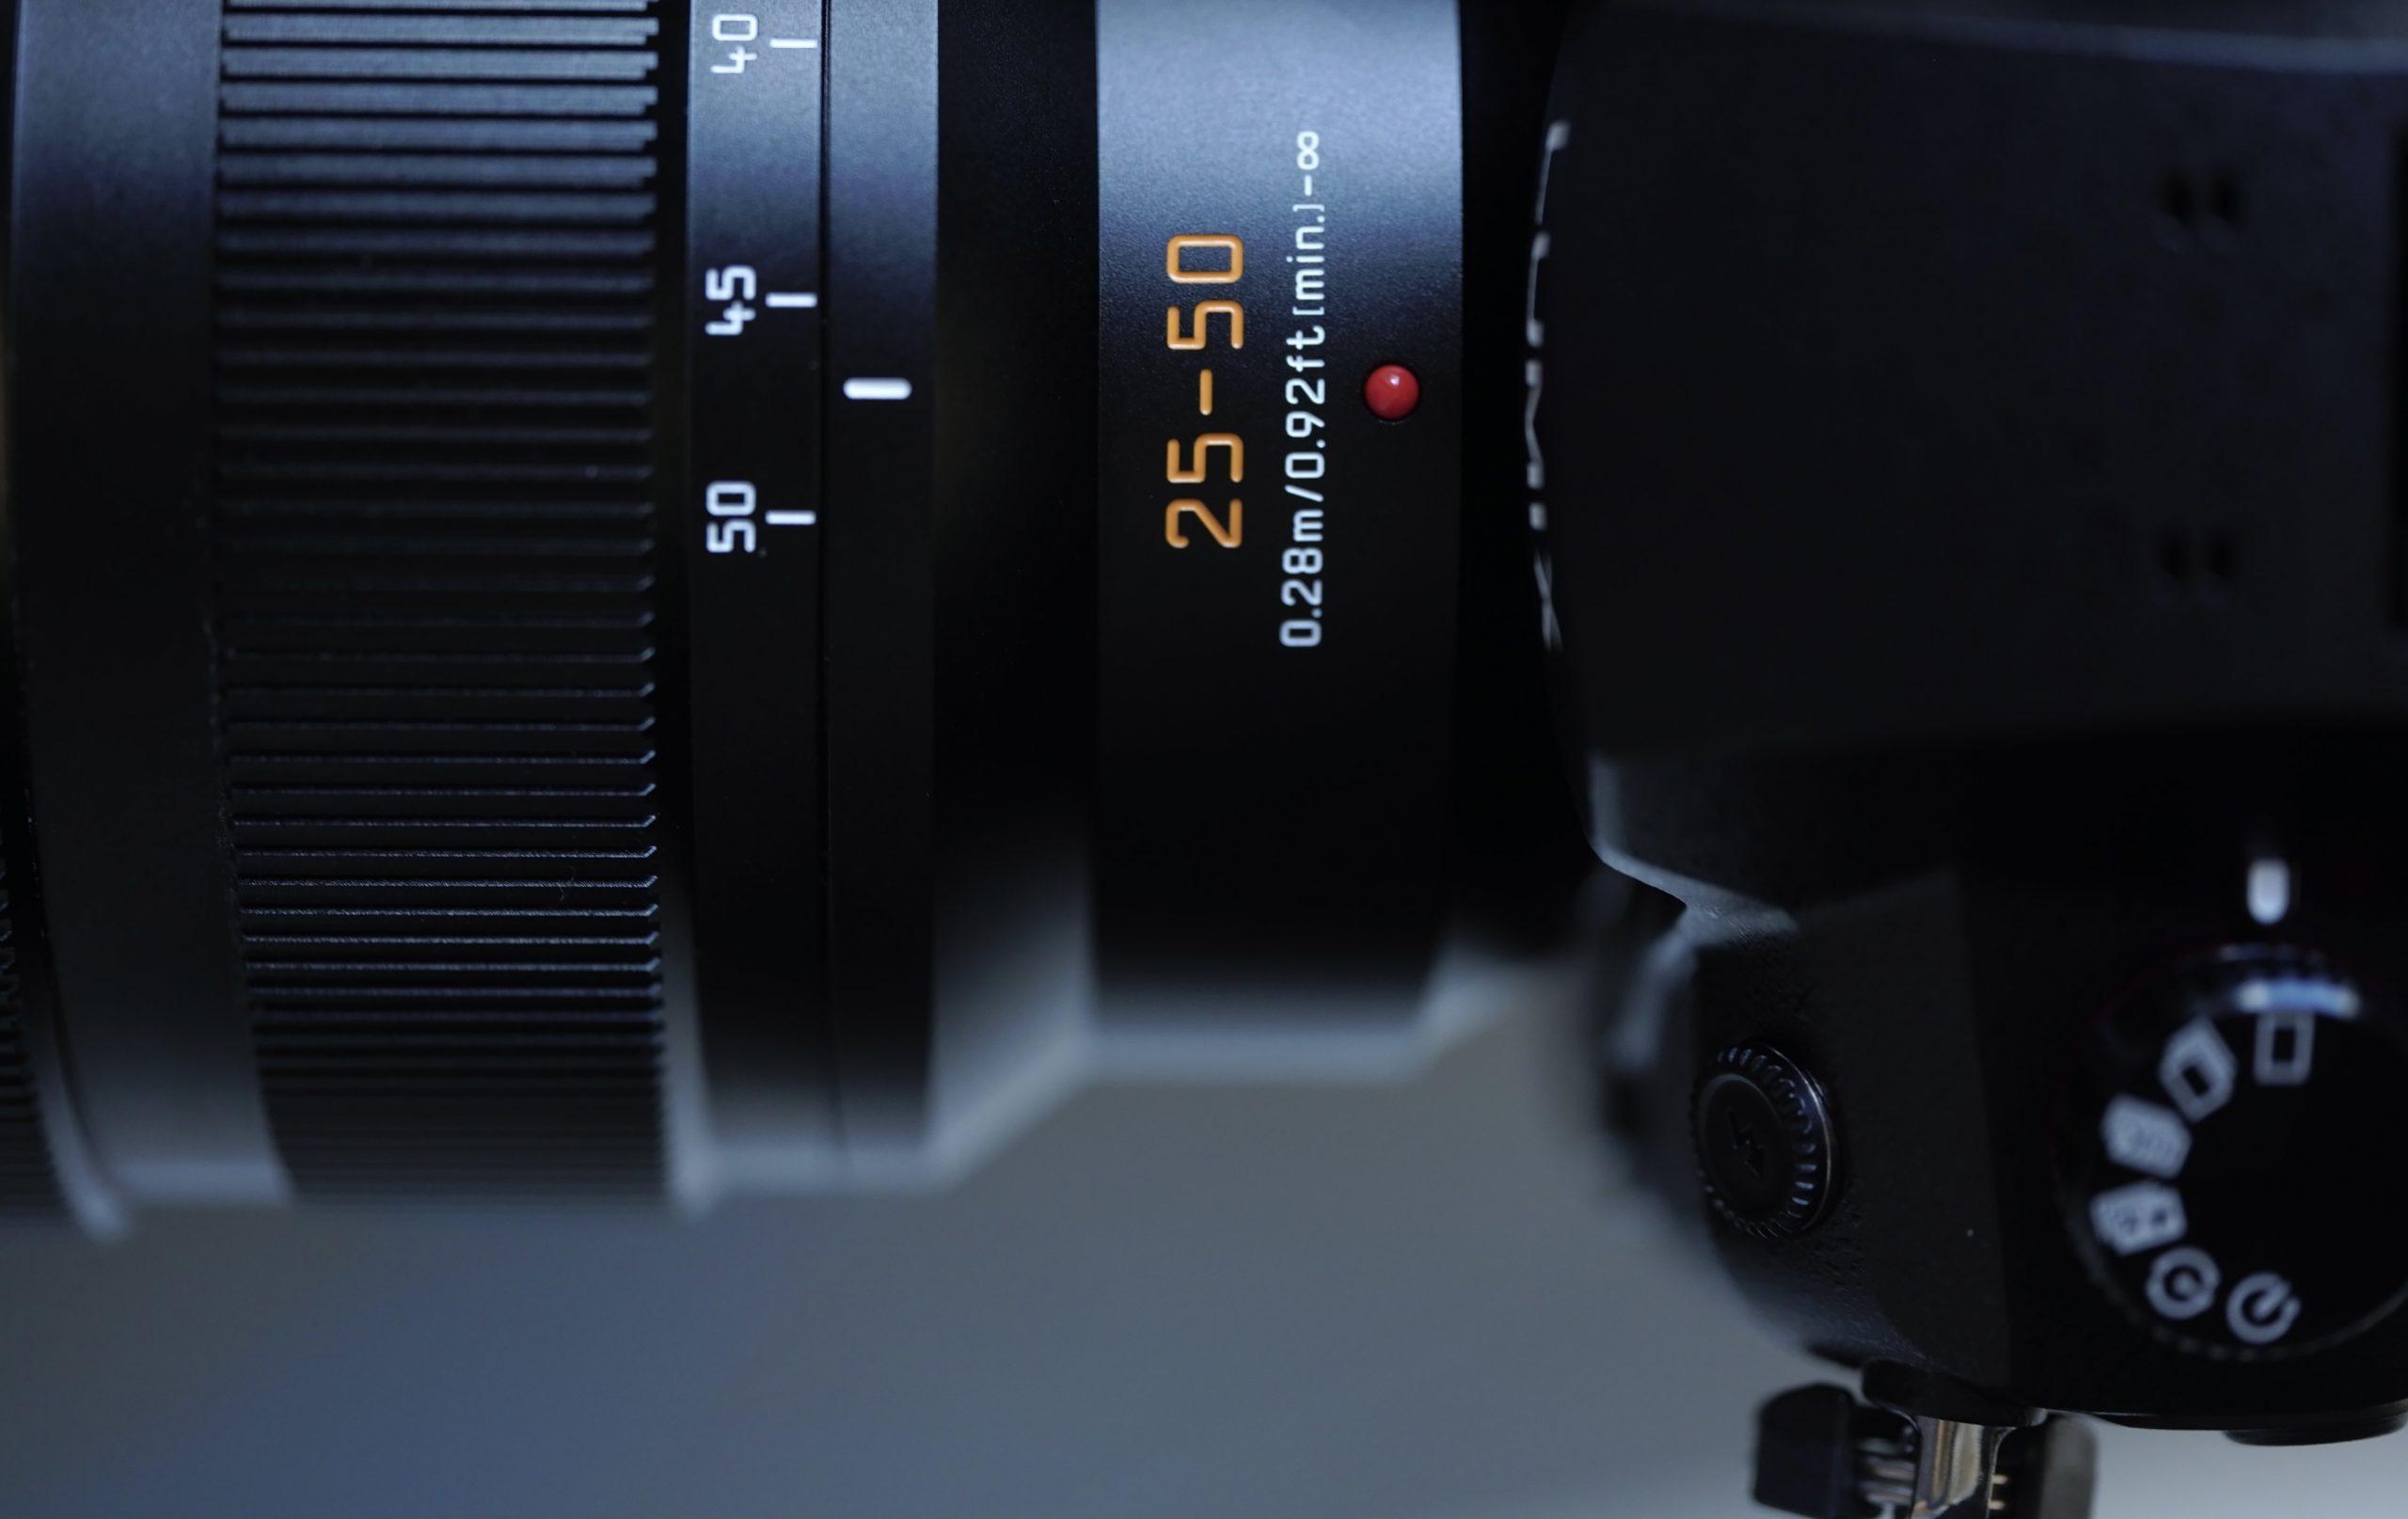 【Panasonic】本日発売!LEICA DG VARIO-SUMMILUX 25-50mm F1.7 ASPH.